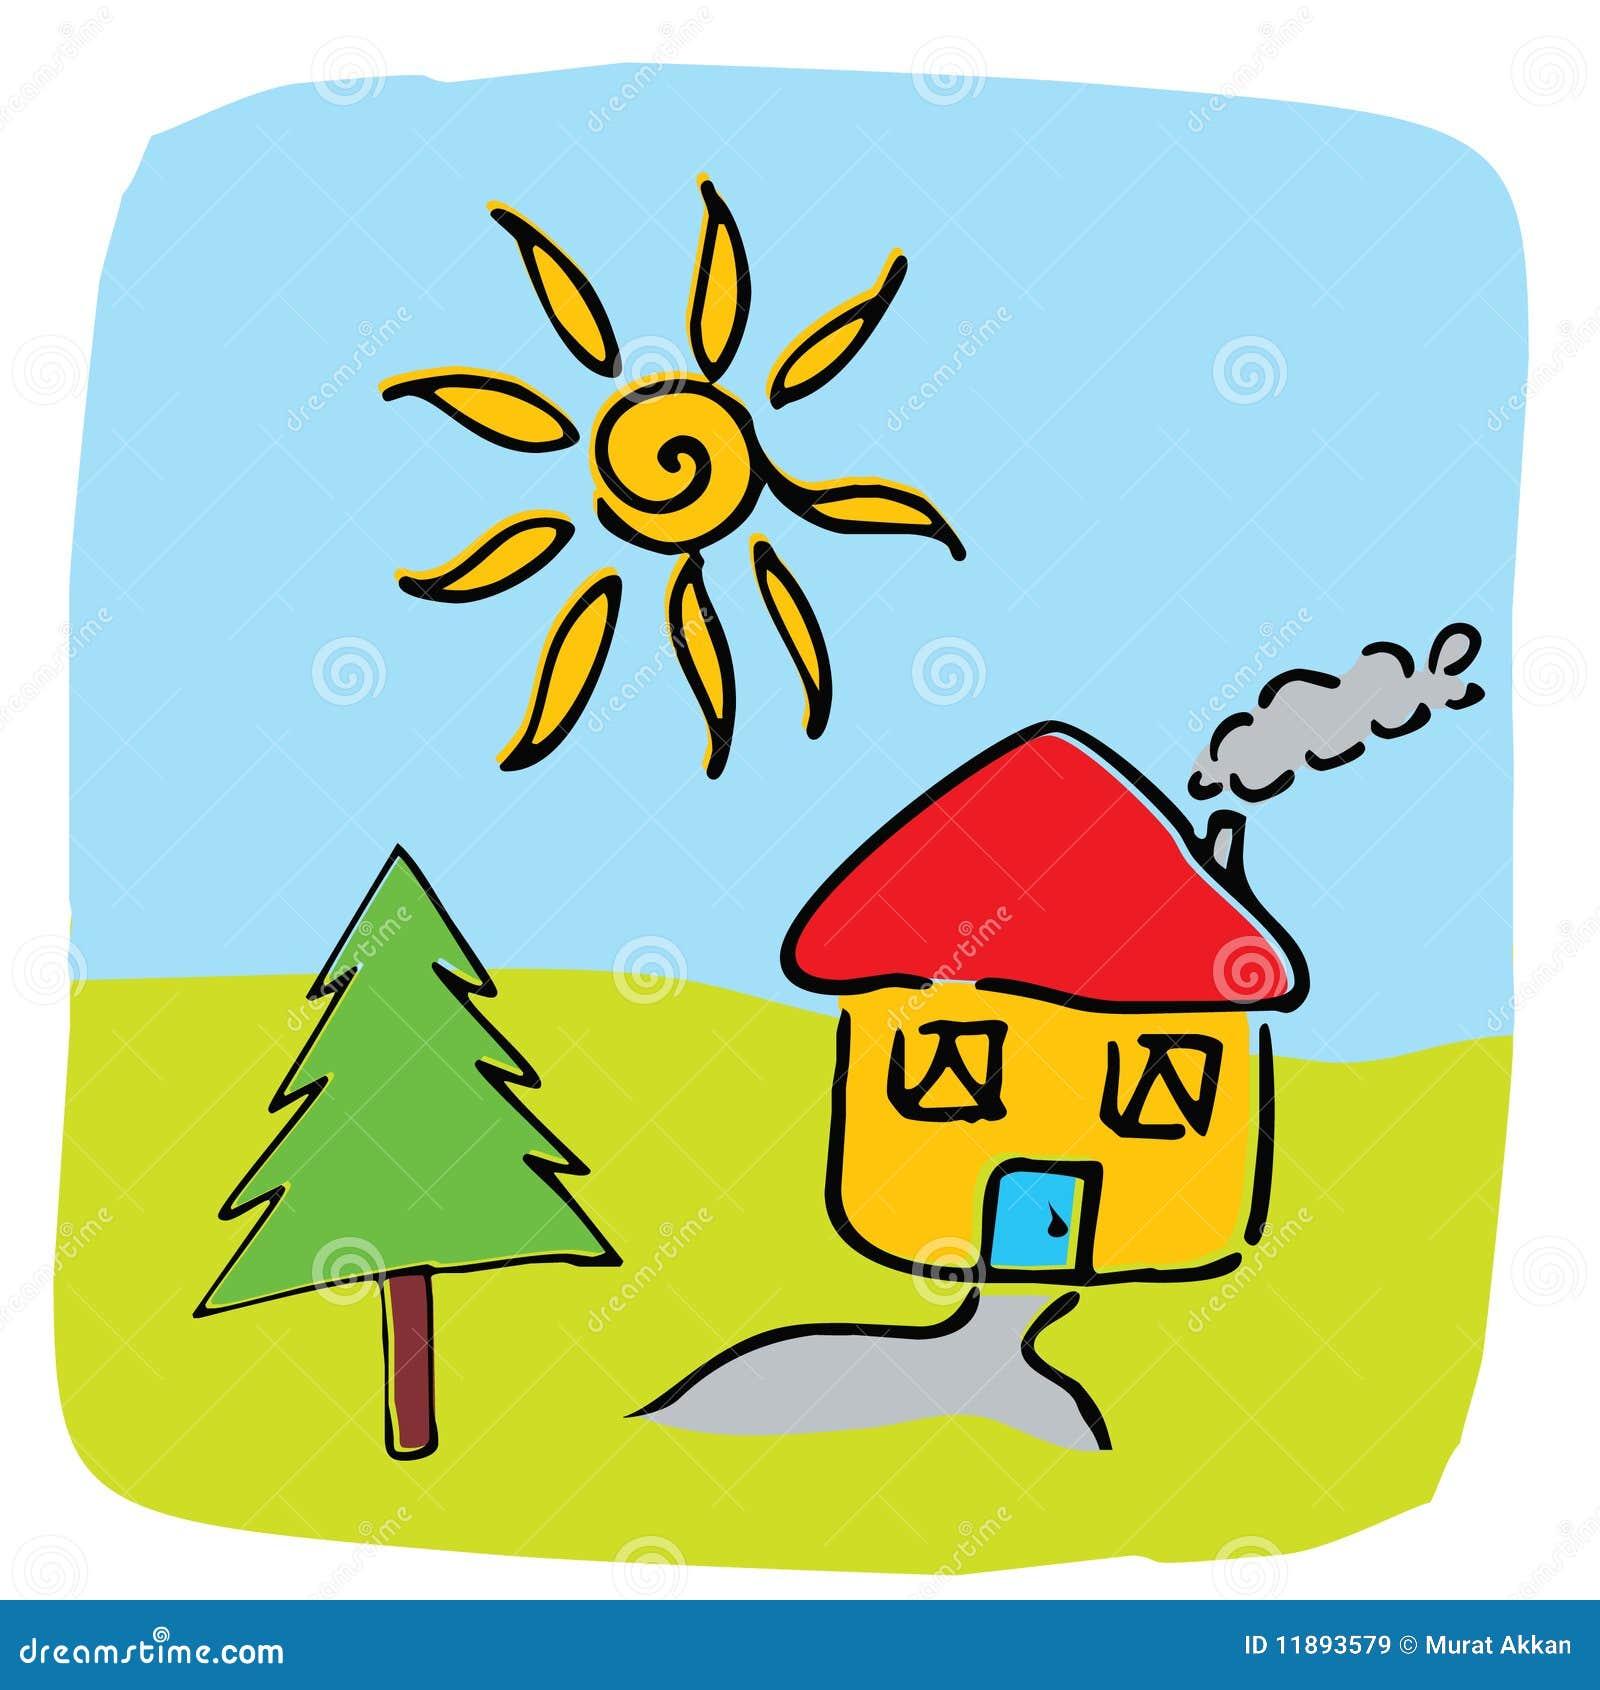 Home illustrationvektor